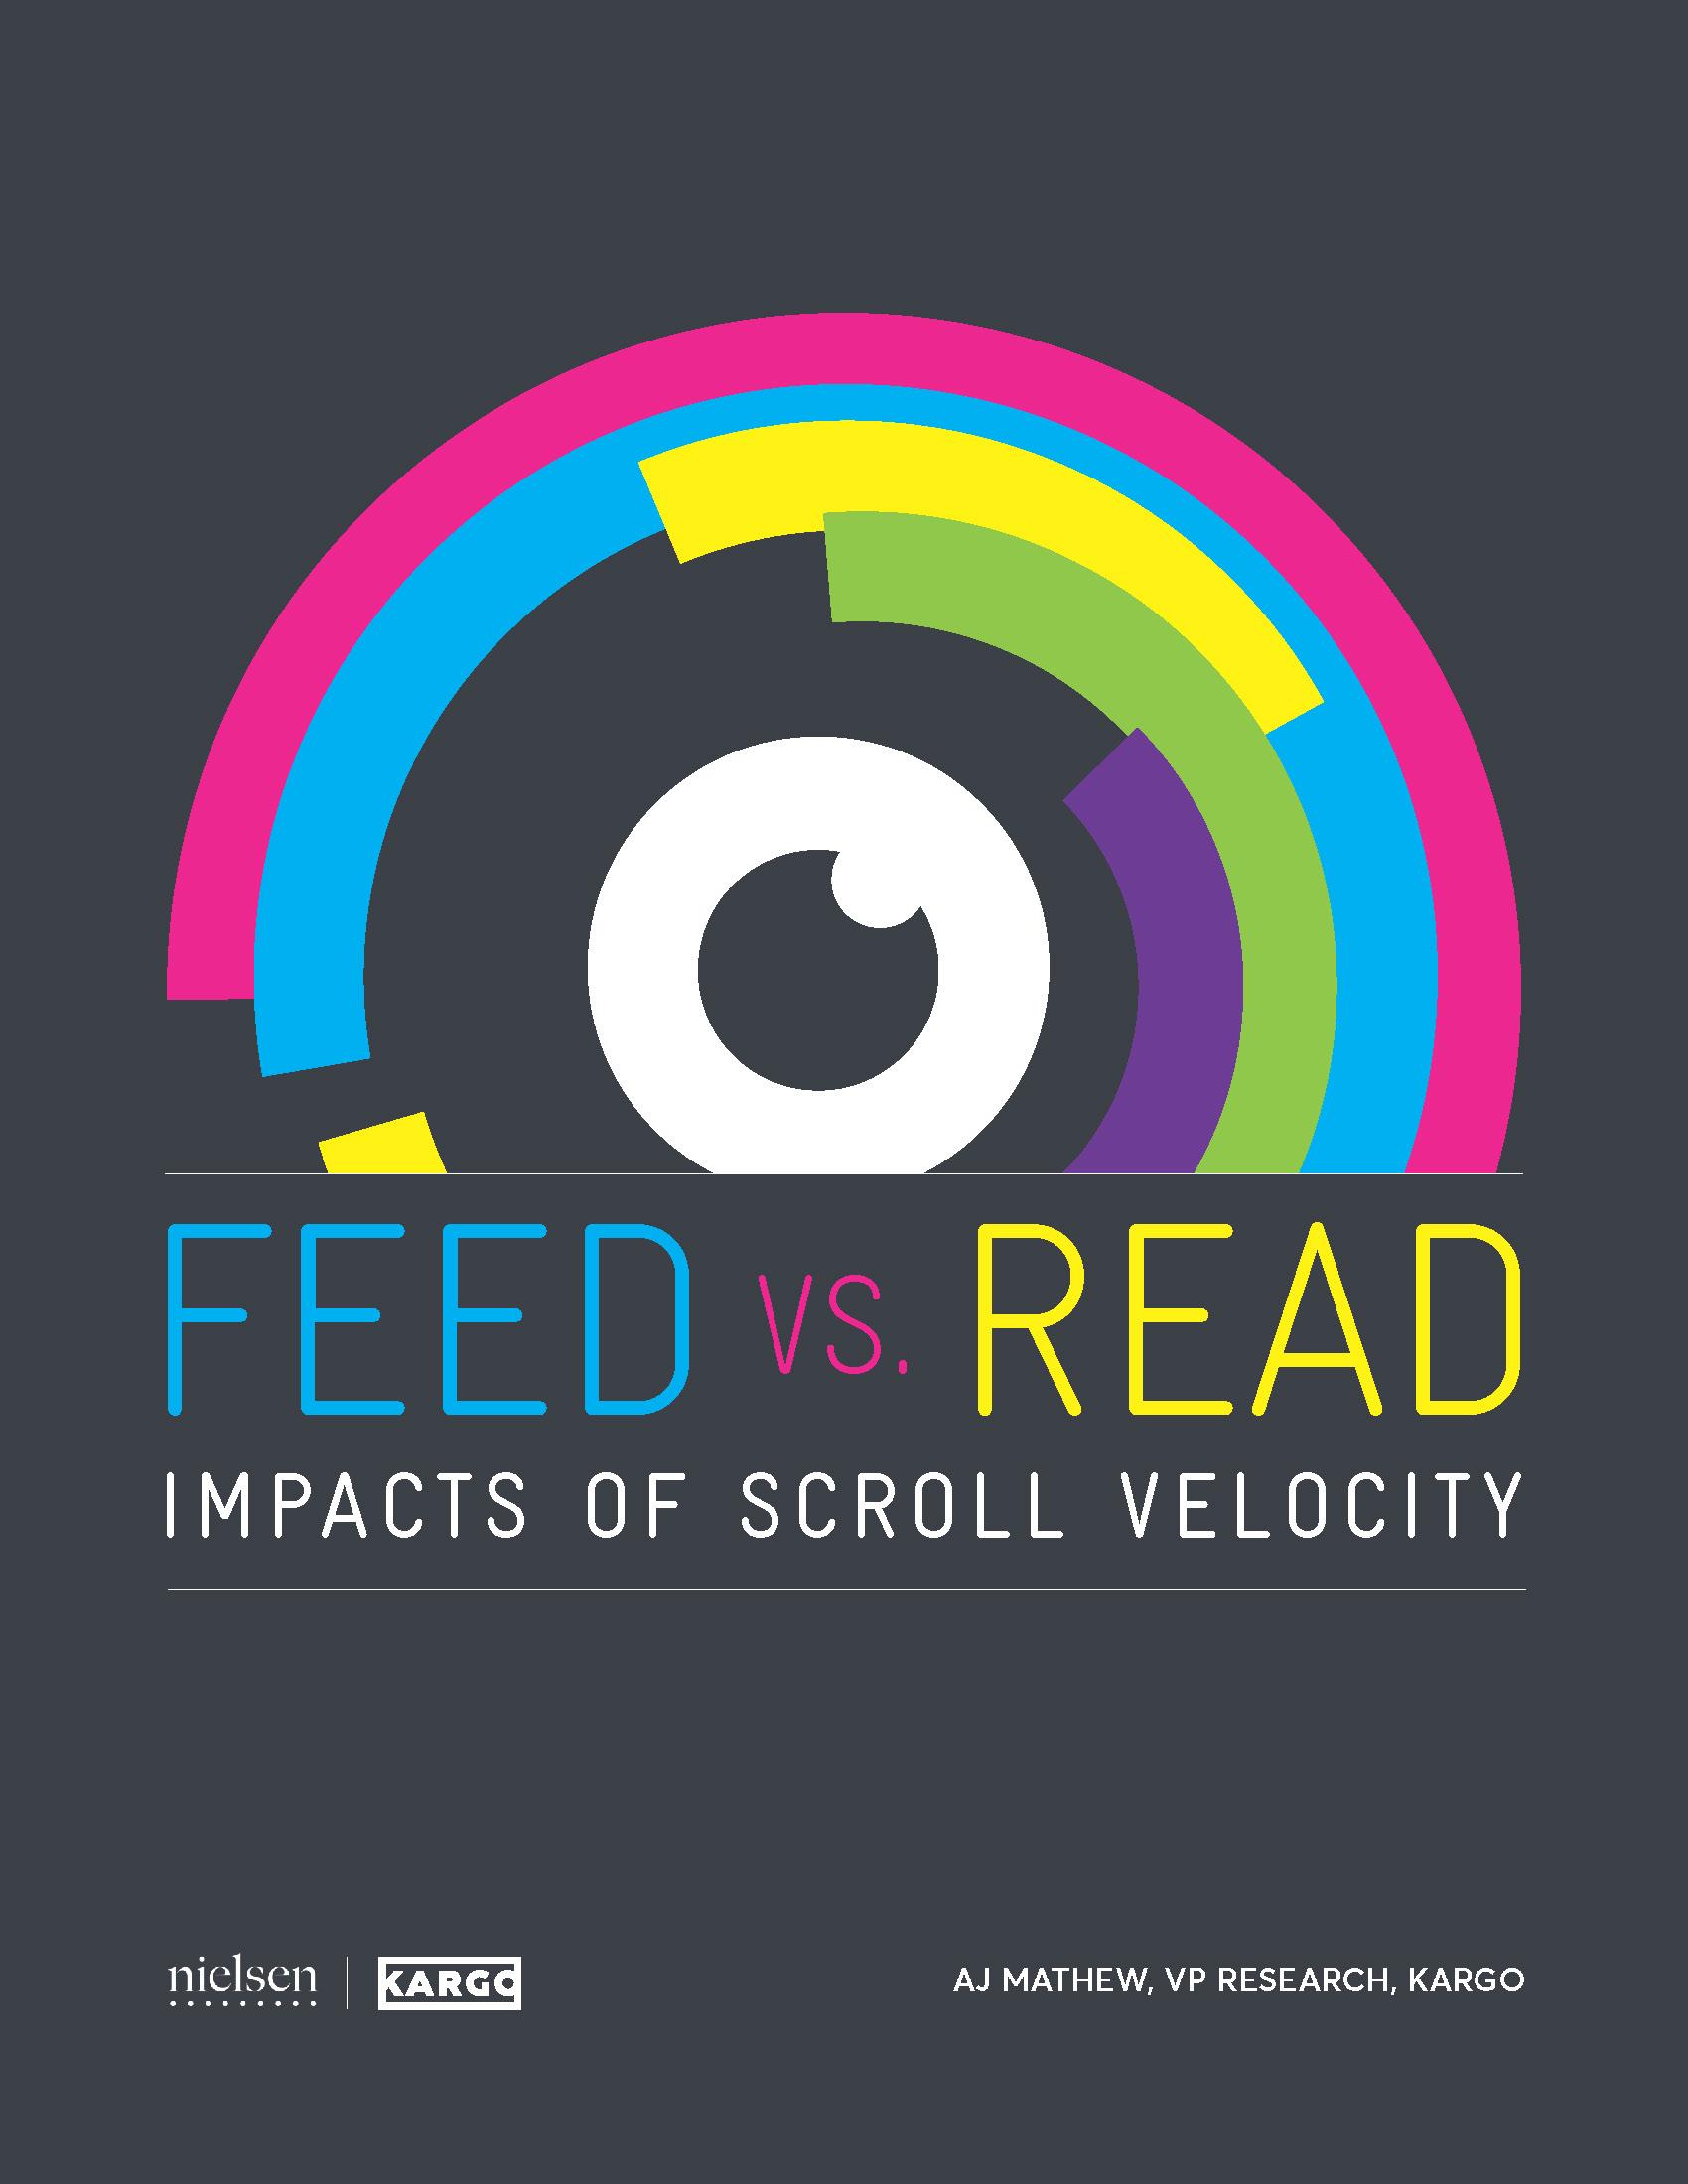 Feed vs Read Study_Page_01.jpeg